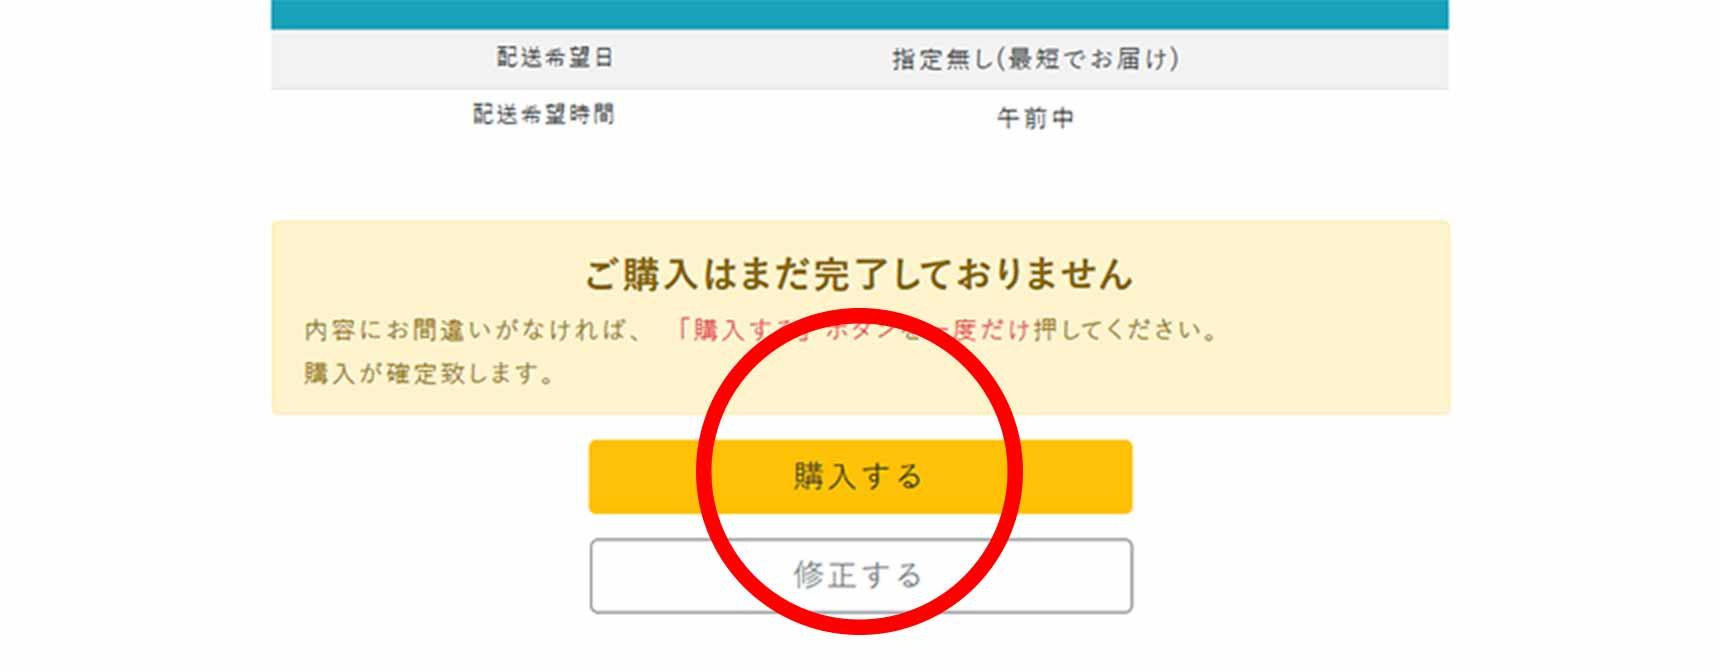 Step. 5